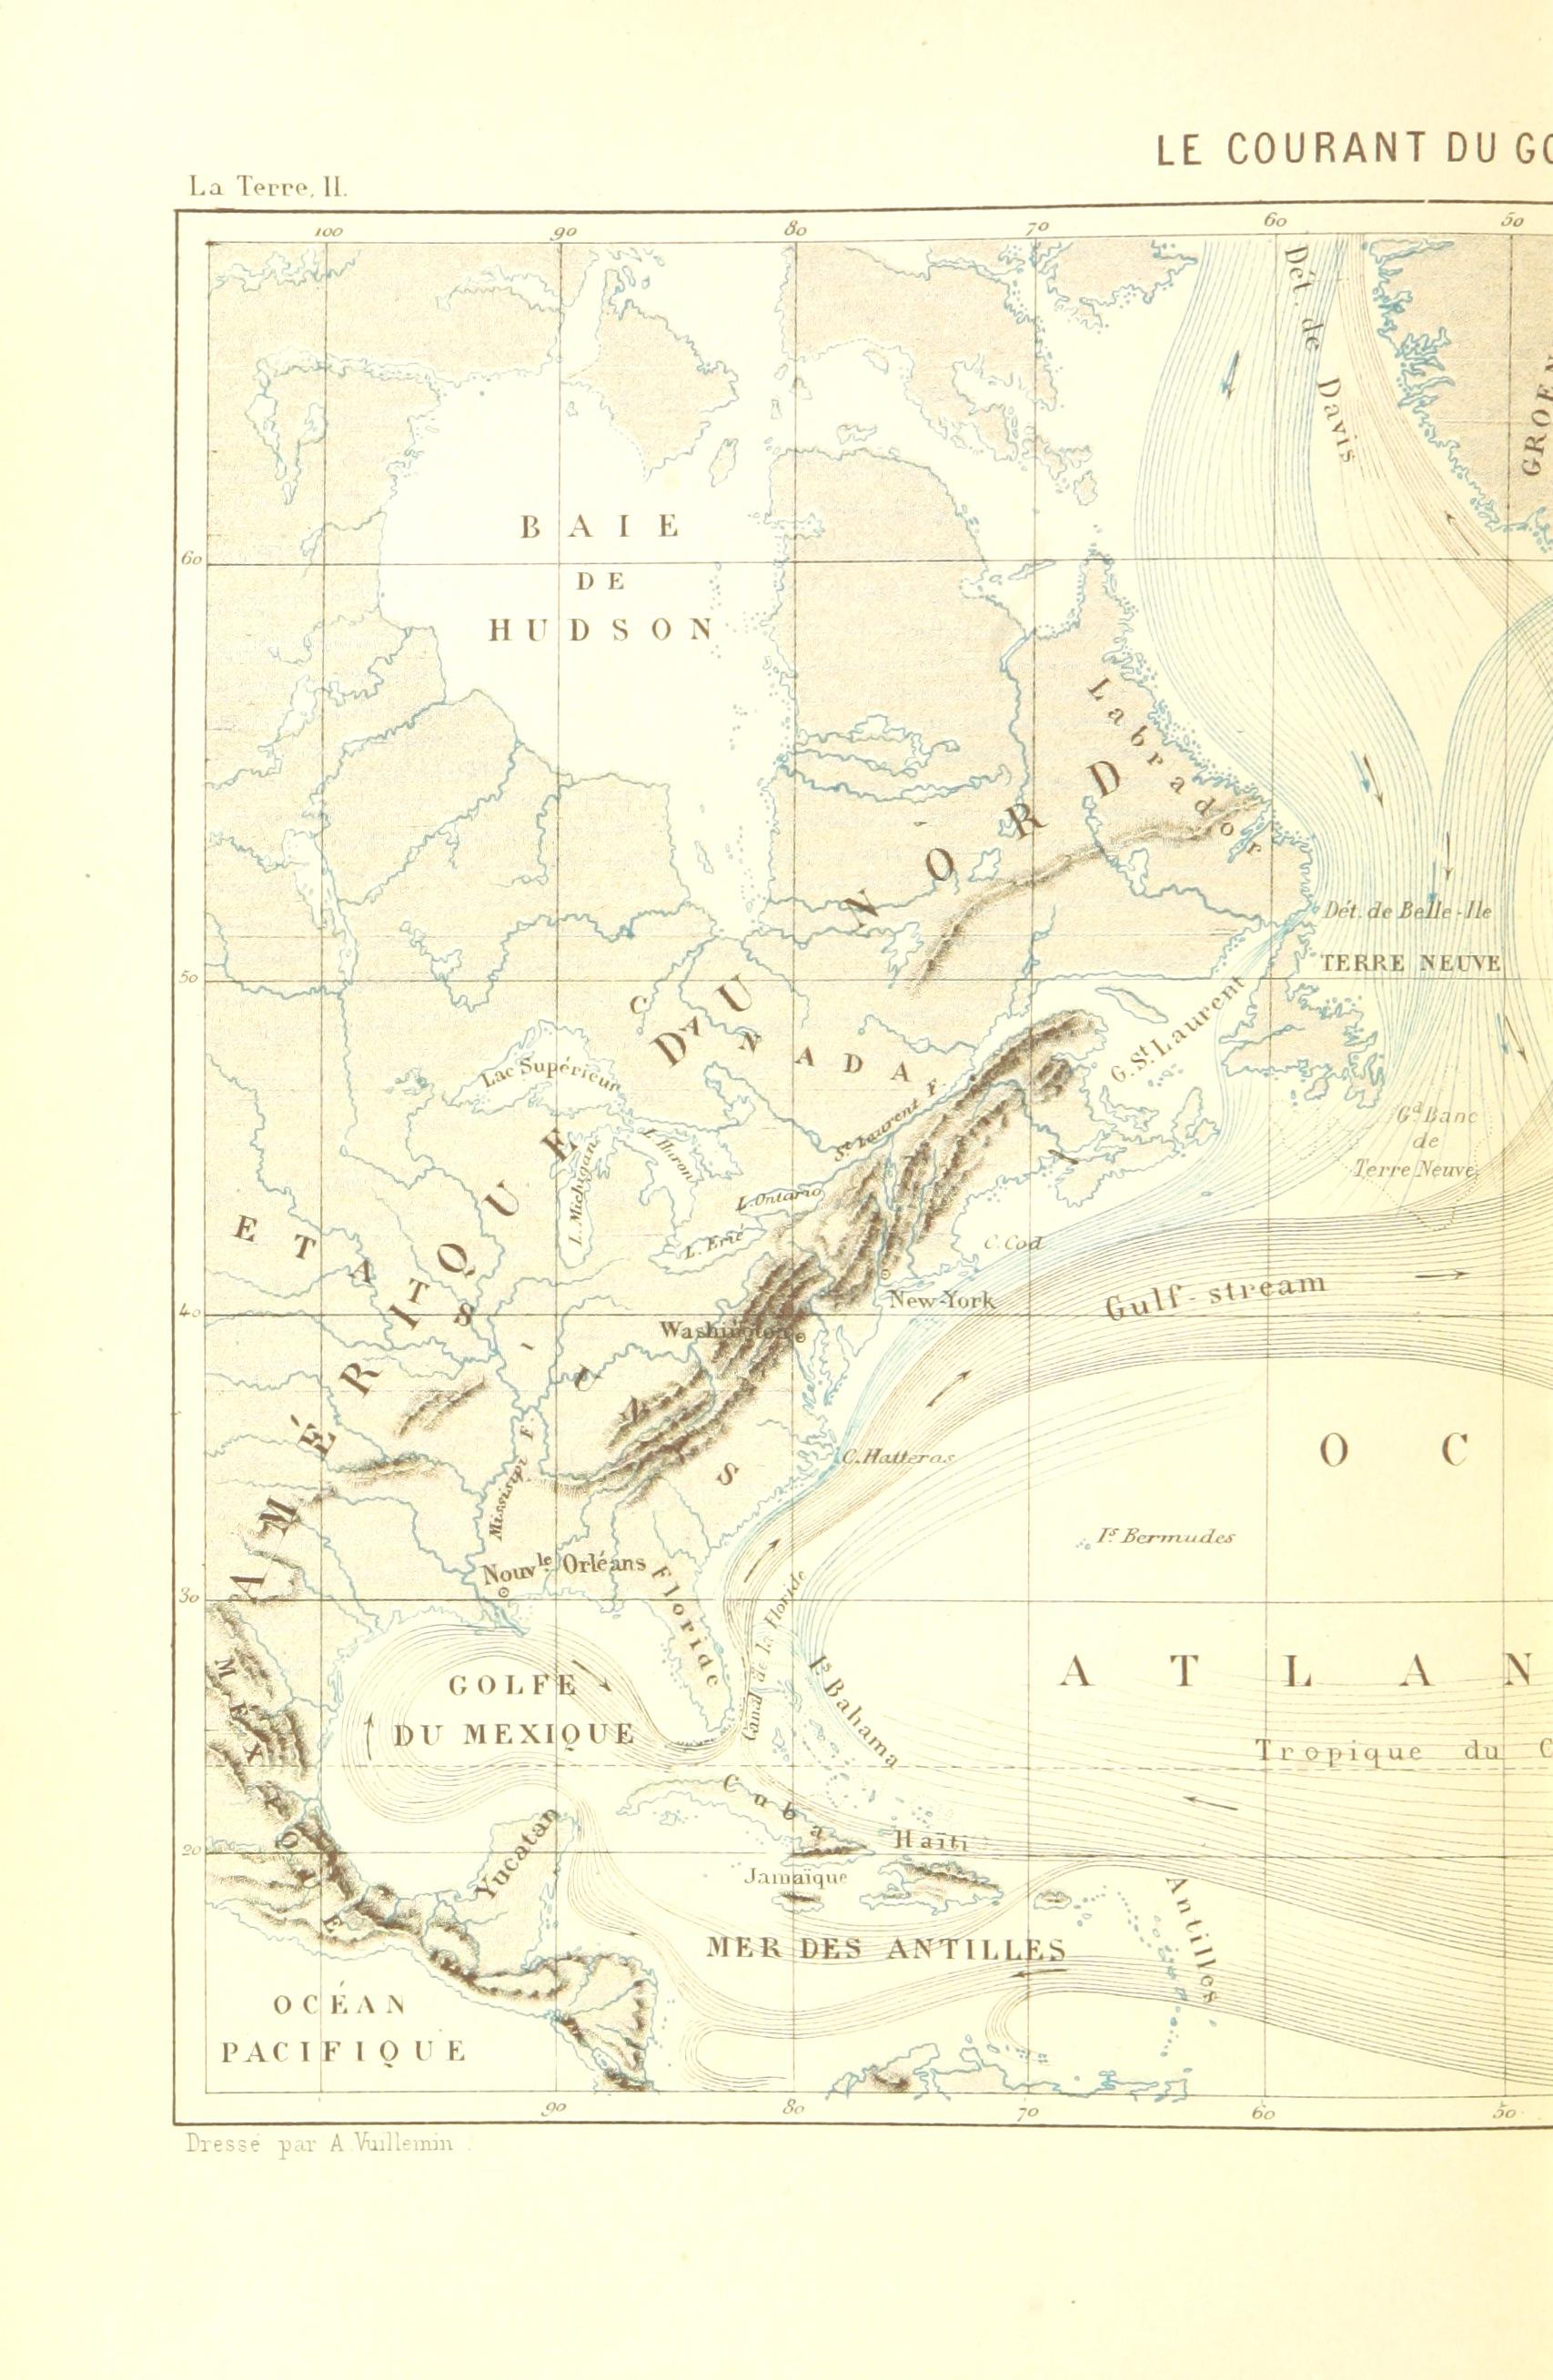 Les Continents De La Terre : continents, terre, File:112, Terre-, Description, Phénomènes, Globe., Continents., L'Ocean,, L'Atmosphere,, (11085749714).jpg, Wikimedia, Commons